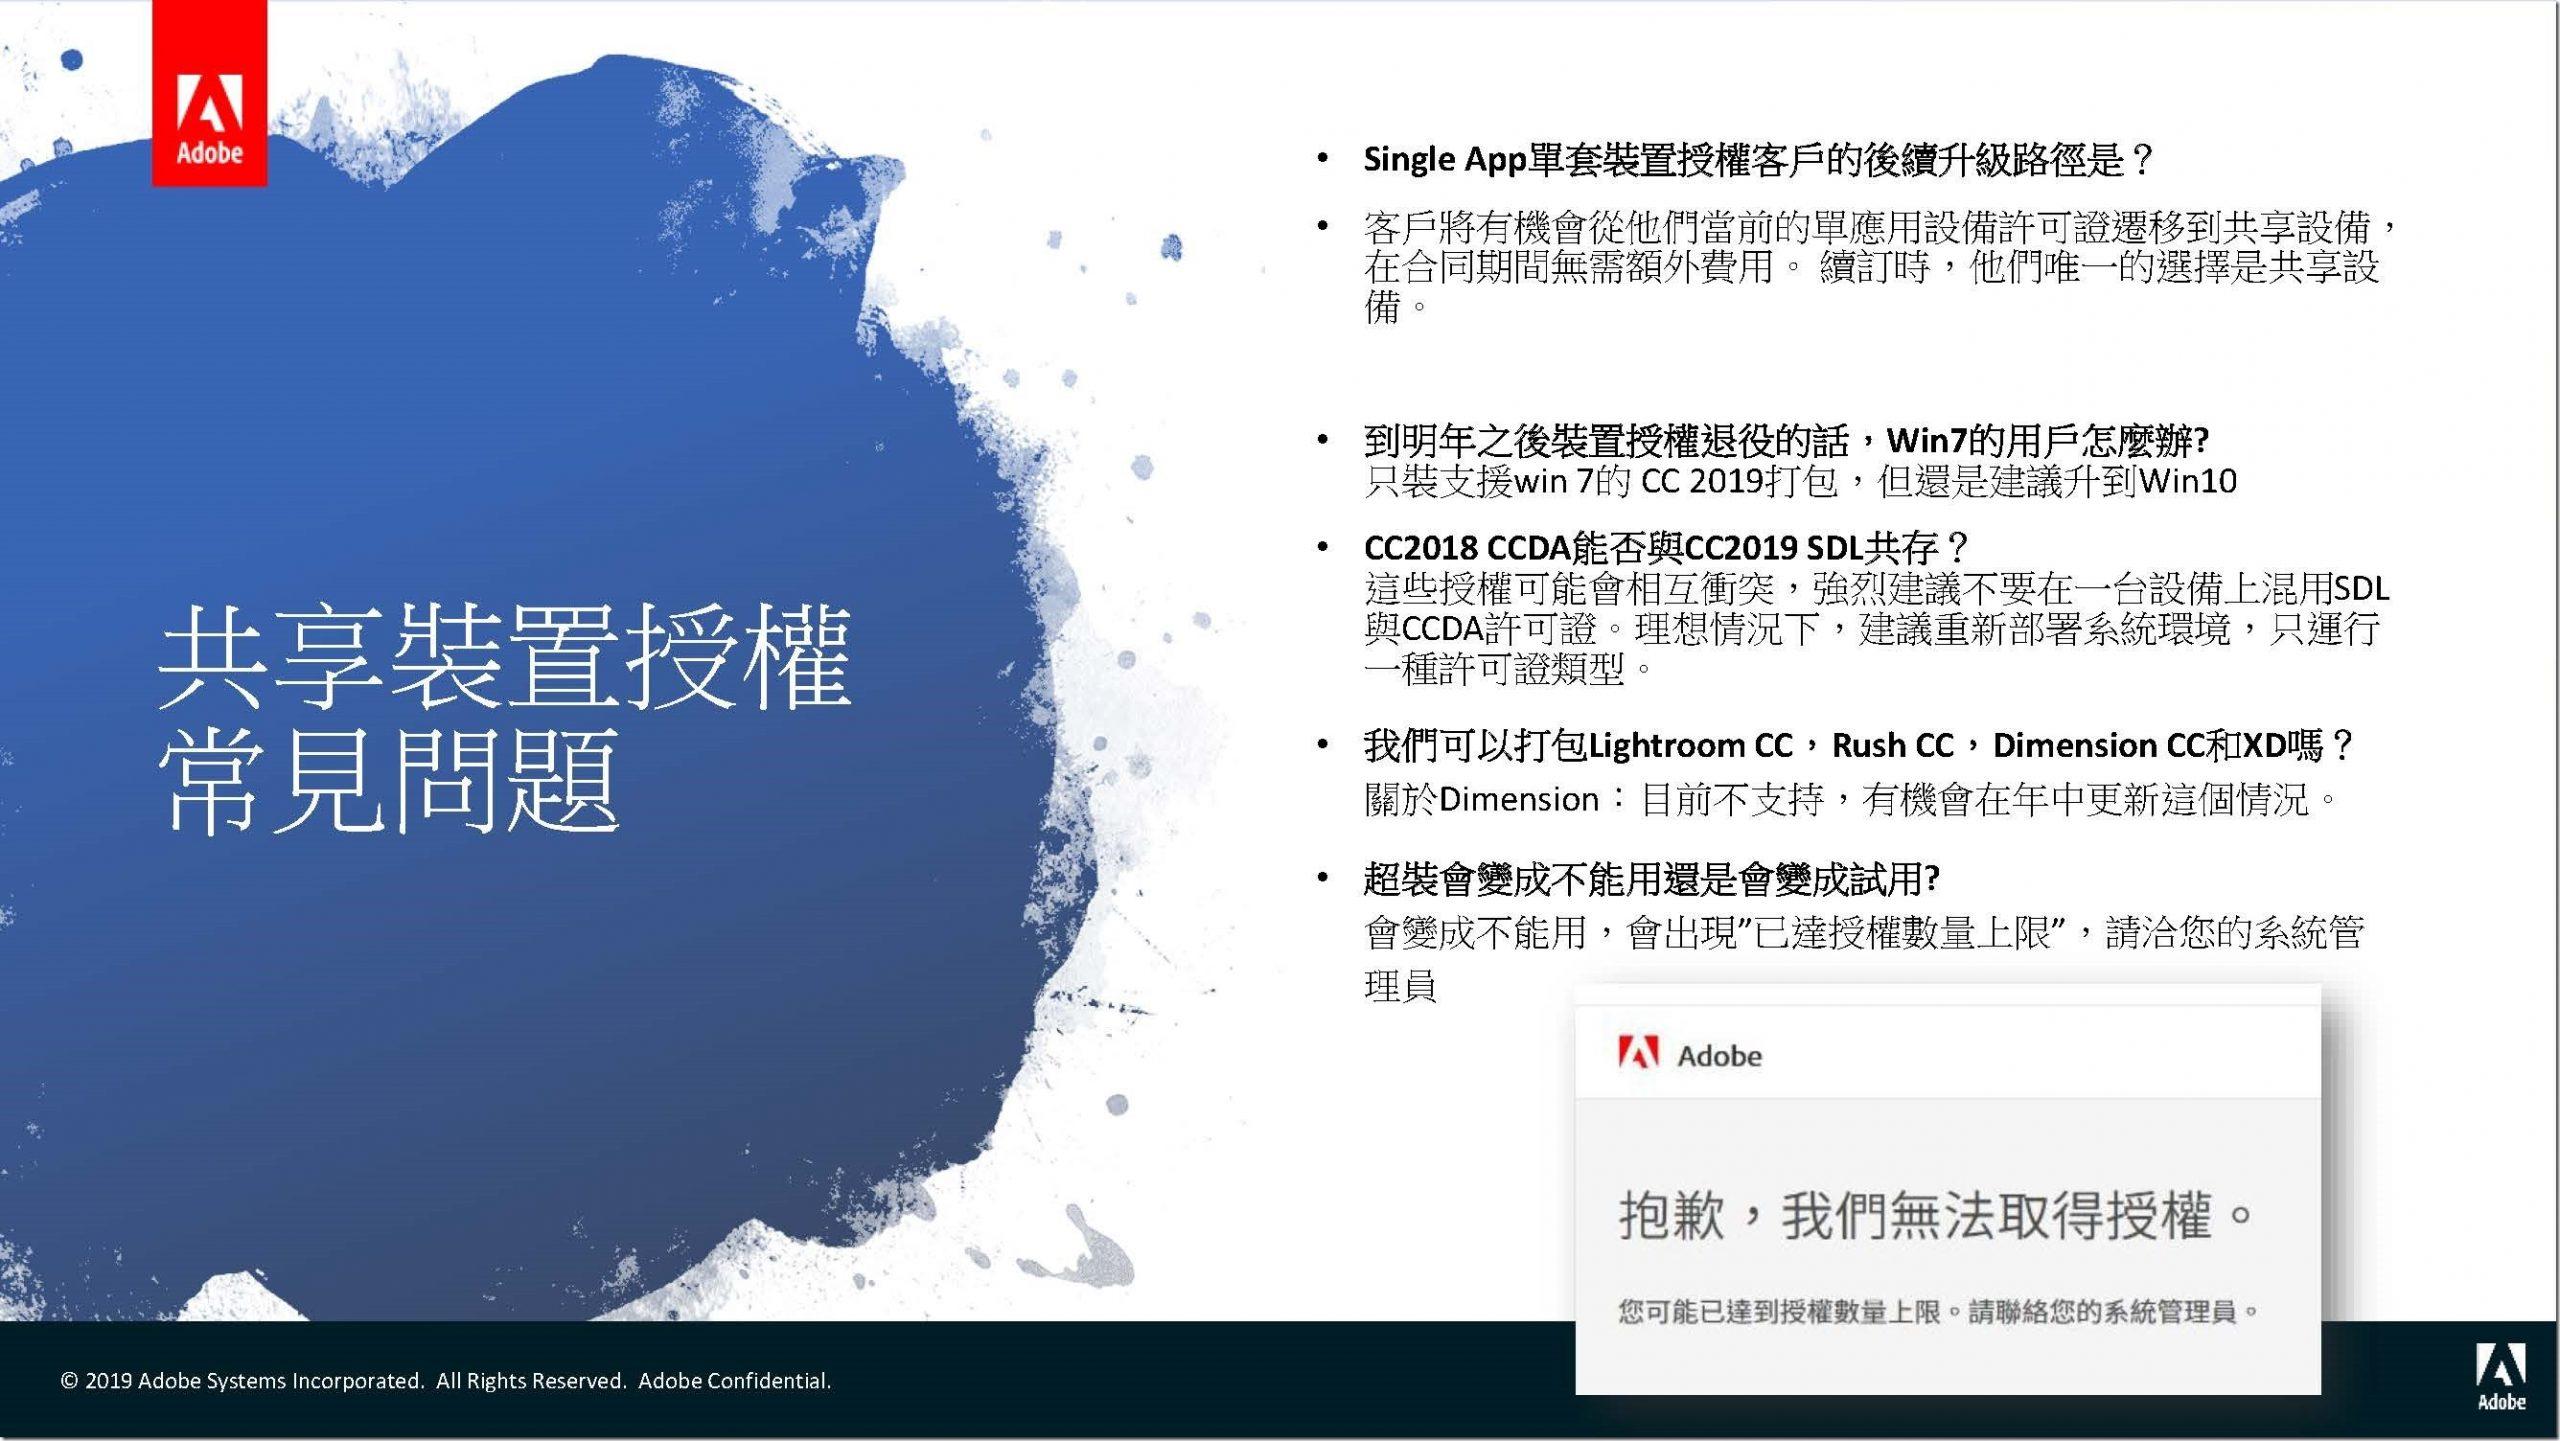 Adobe 共用裝置授權安裝指南_教育通用_頁面_33